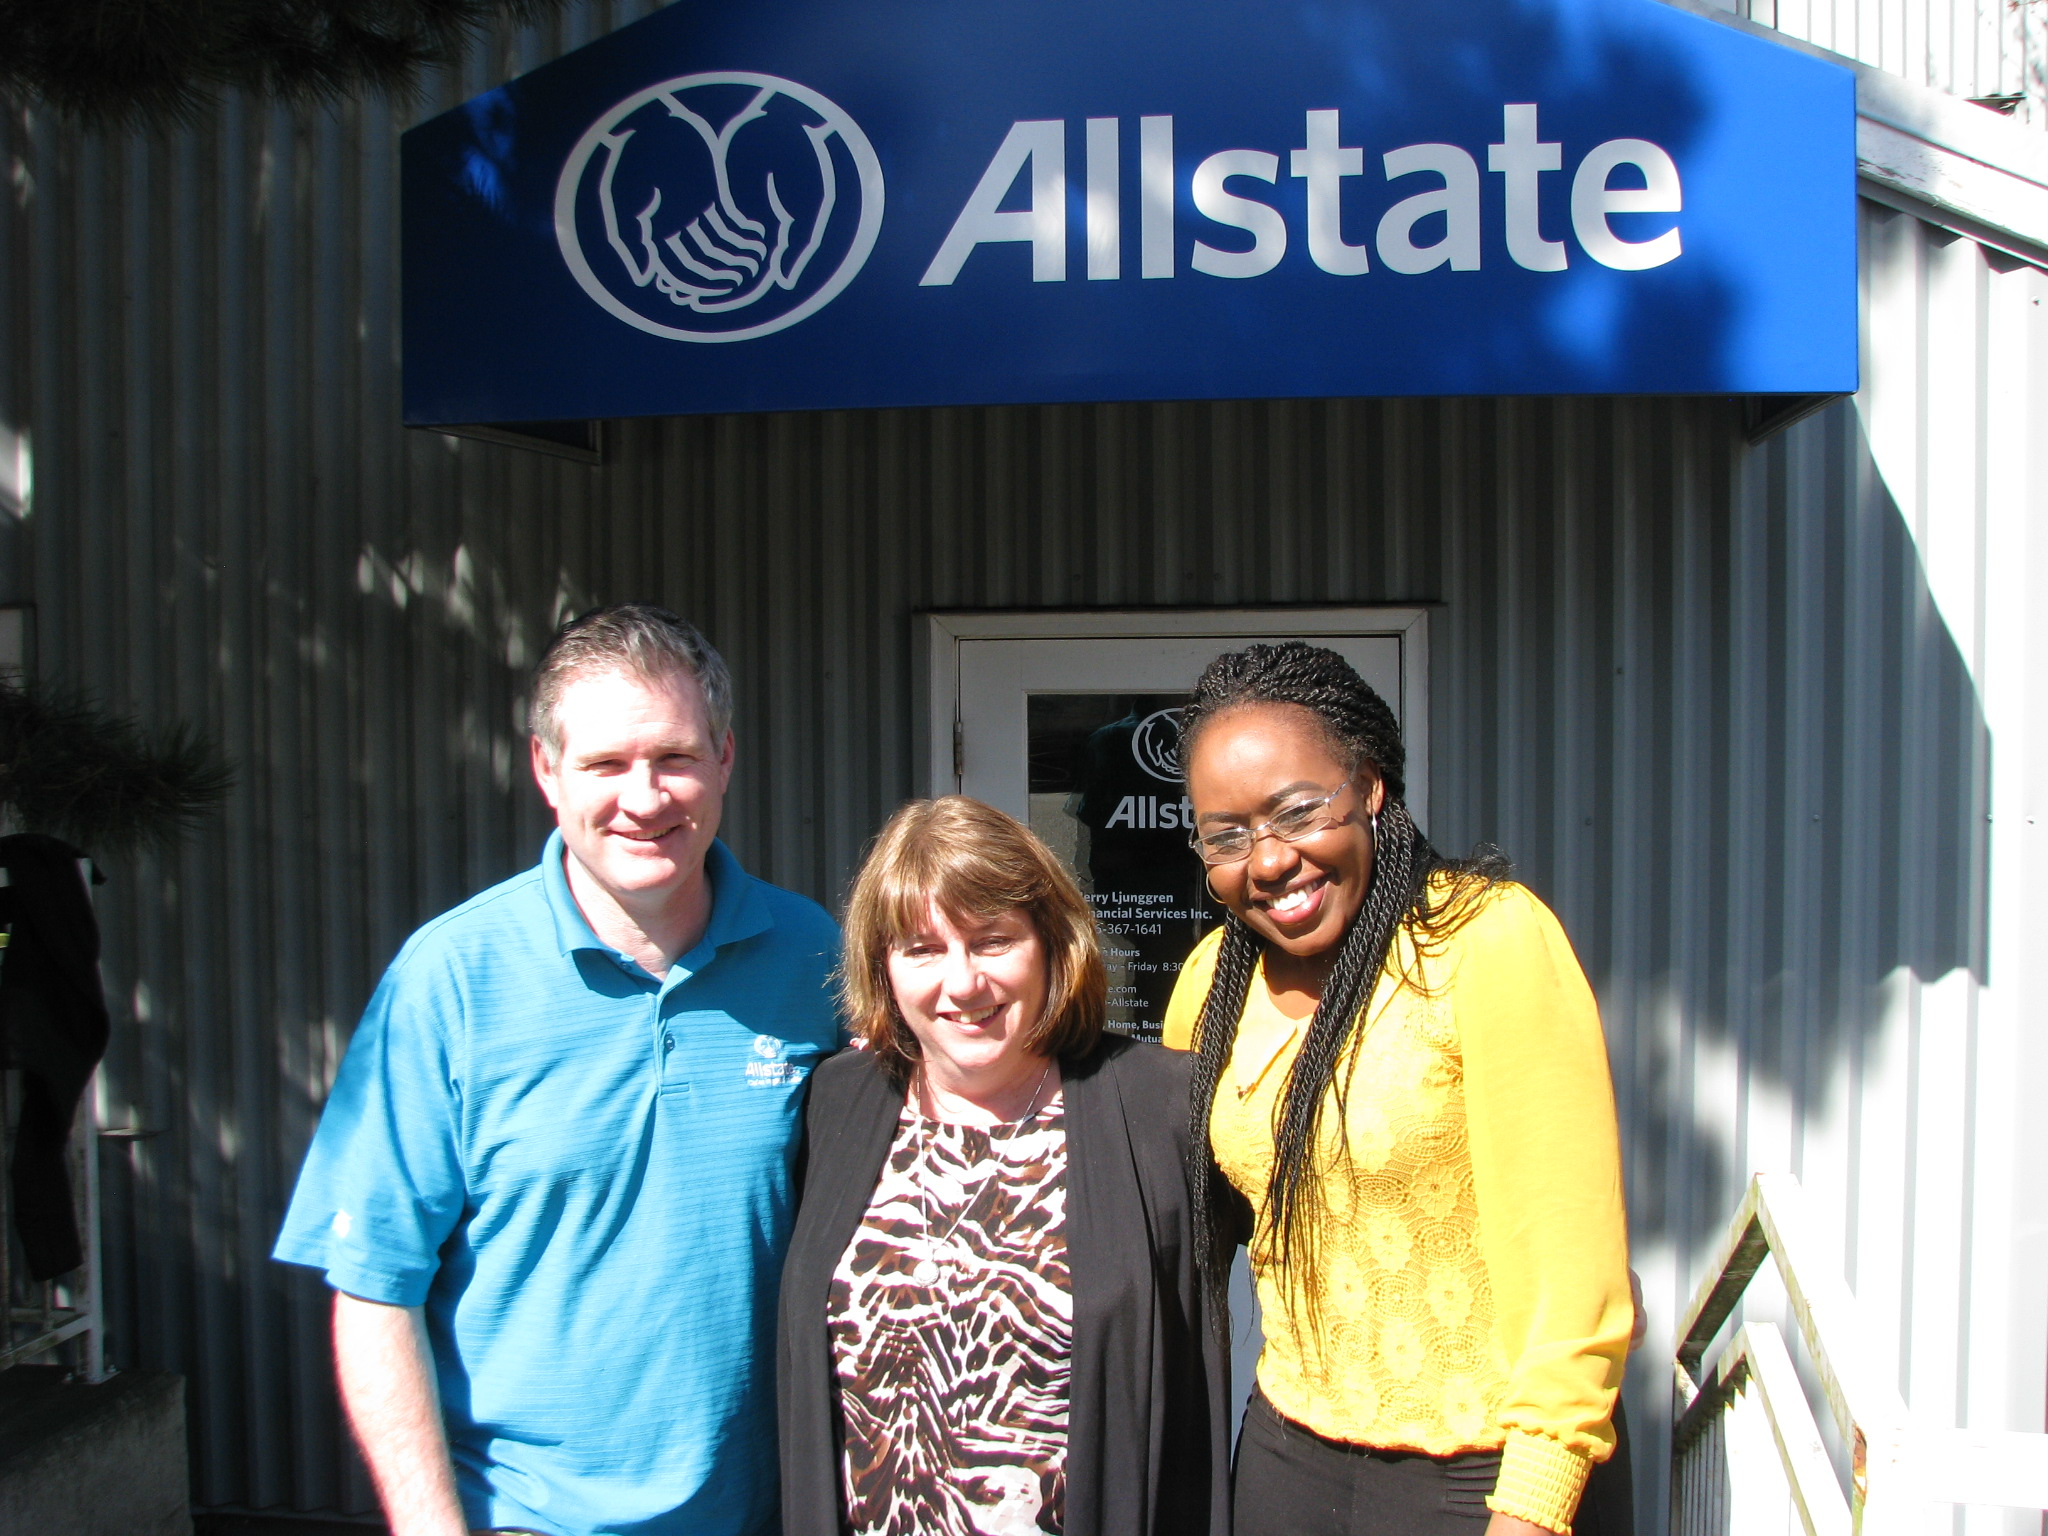 Jerry D Ljunggren: Allstate Insurance | 19524 Ballinger Way NE, Ste B, Shoreline, WA, 98155 | +1 (206) 367-1641